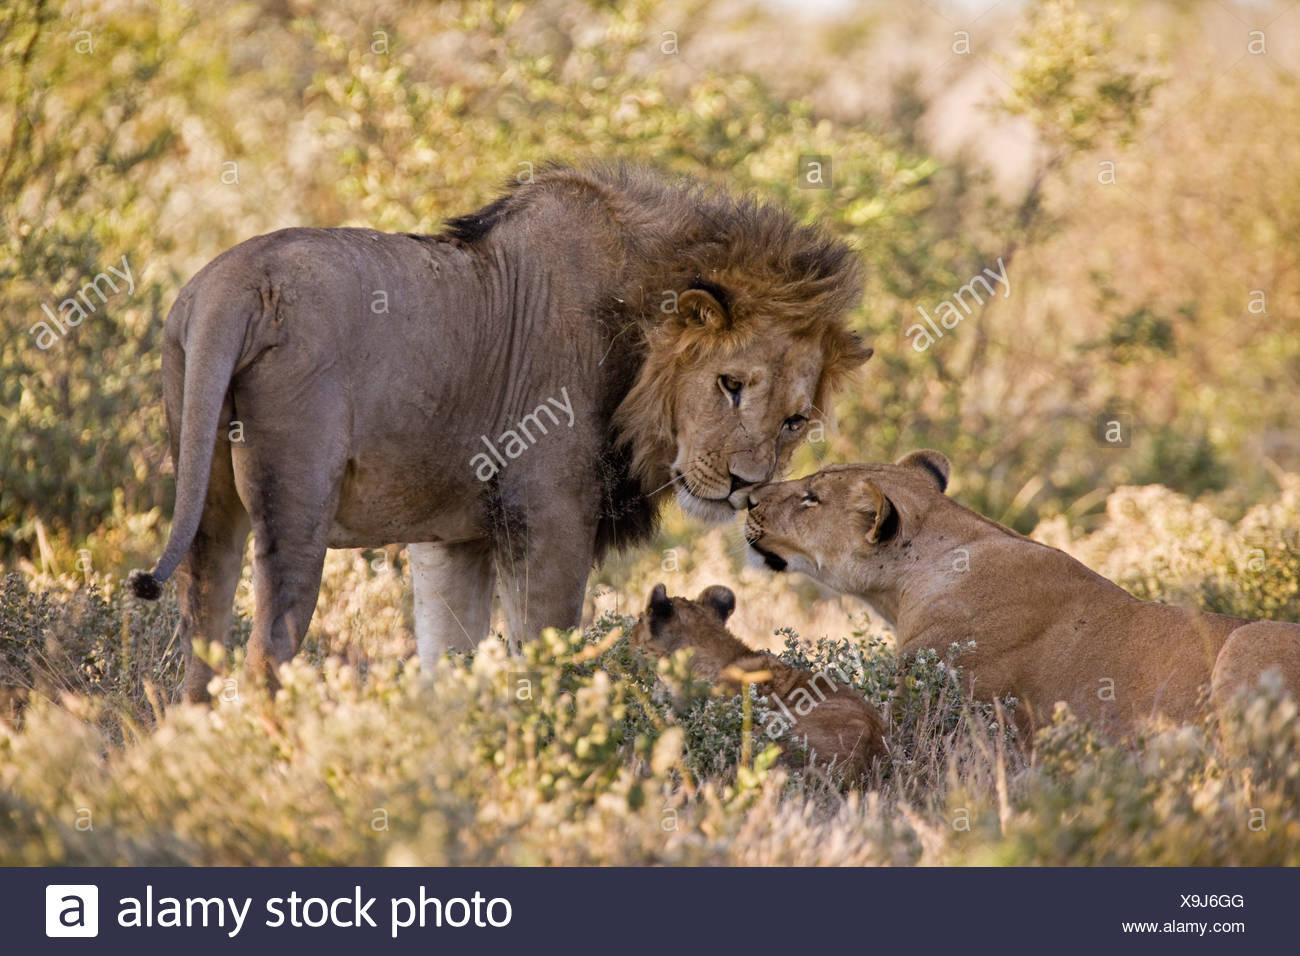 Africa, Botswana, African Lion (Panthera leo) Lioness (Panthera leo) and cub Stock Photo